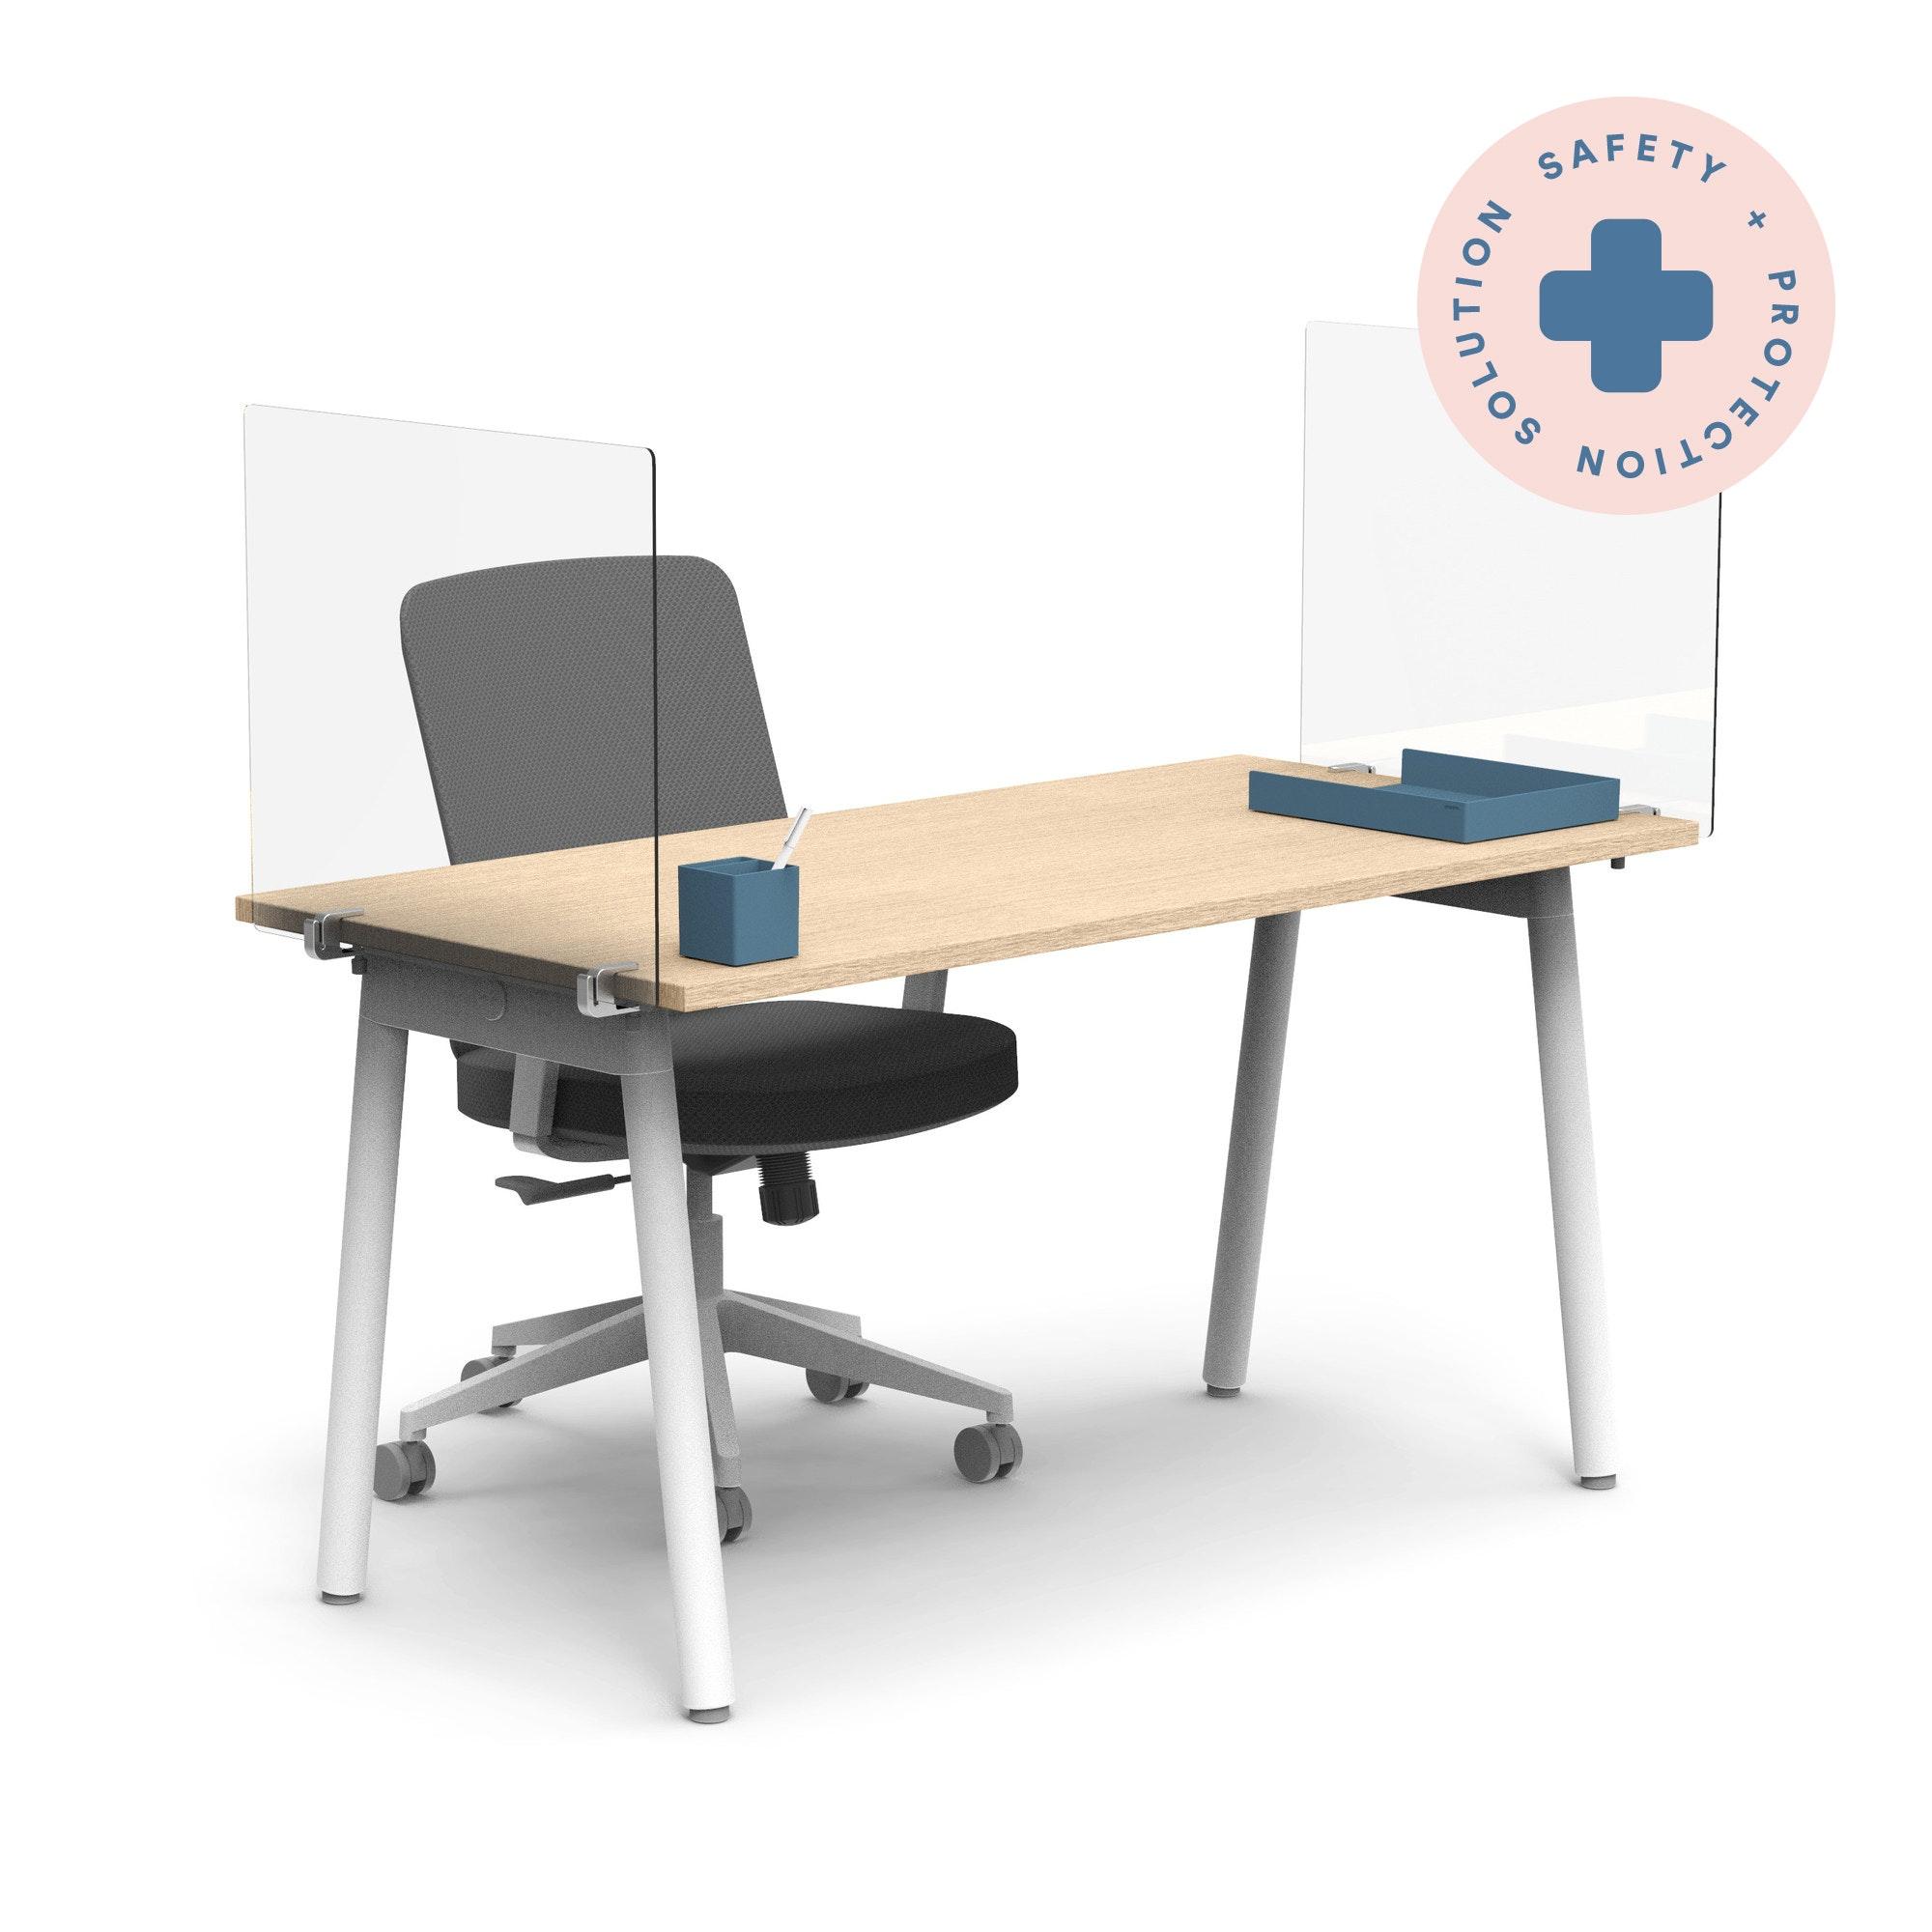 Foldable Work Station Shield 24H X 30W 22D Acrylic .150